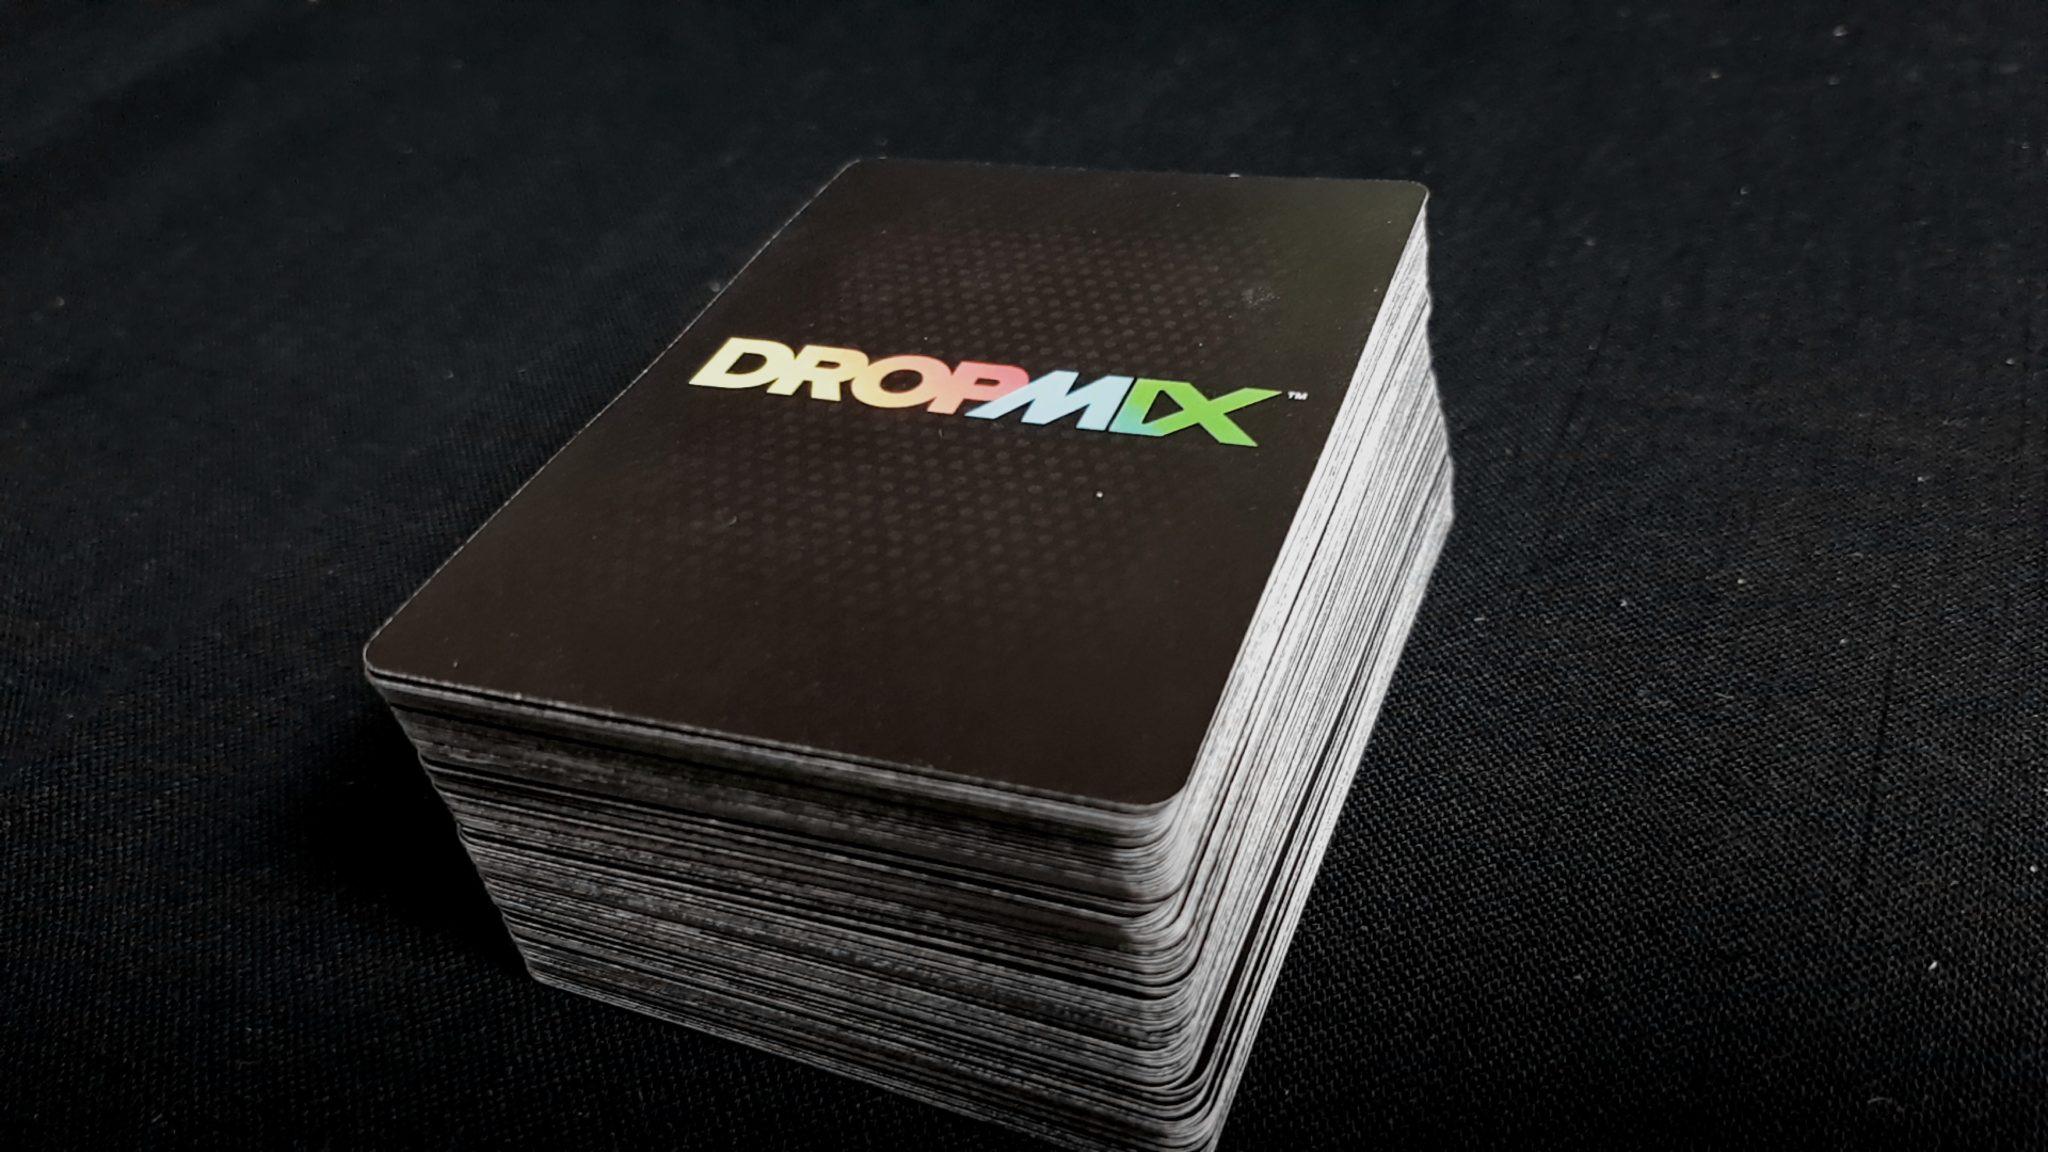 Dropmix deck